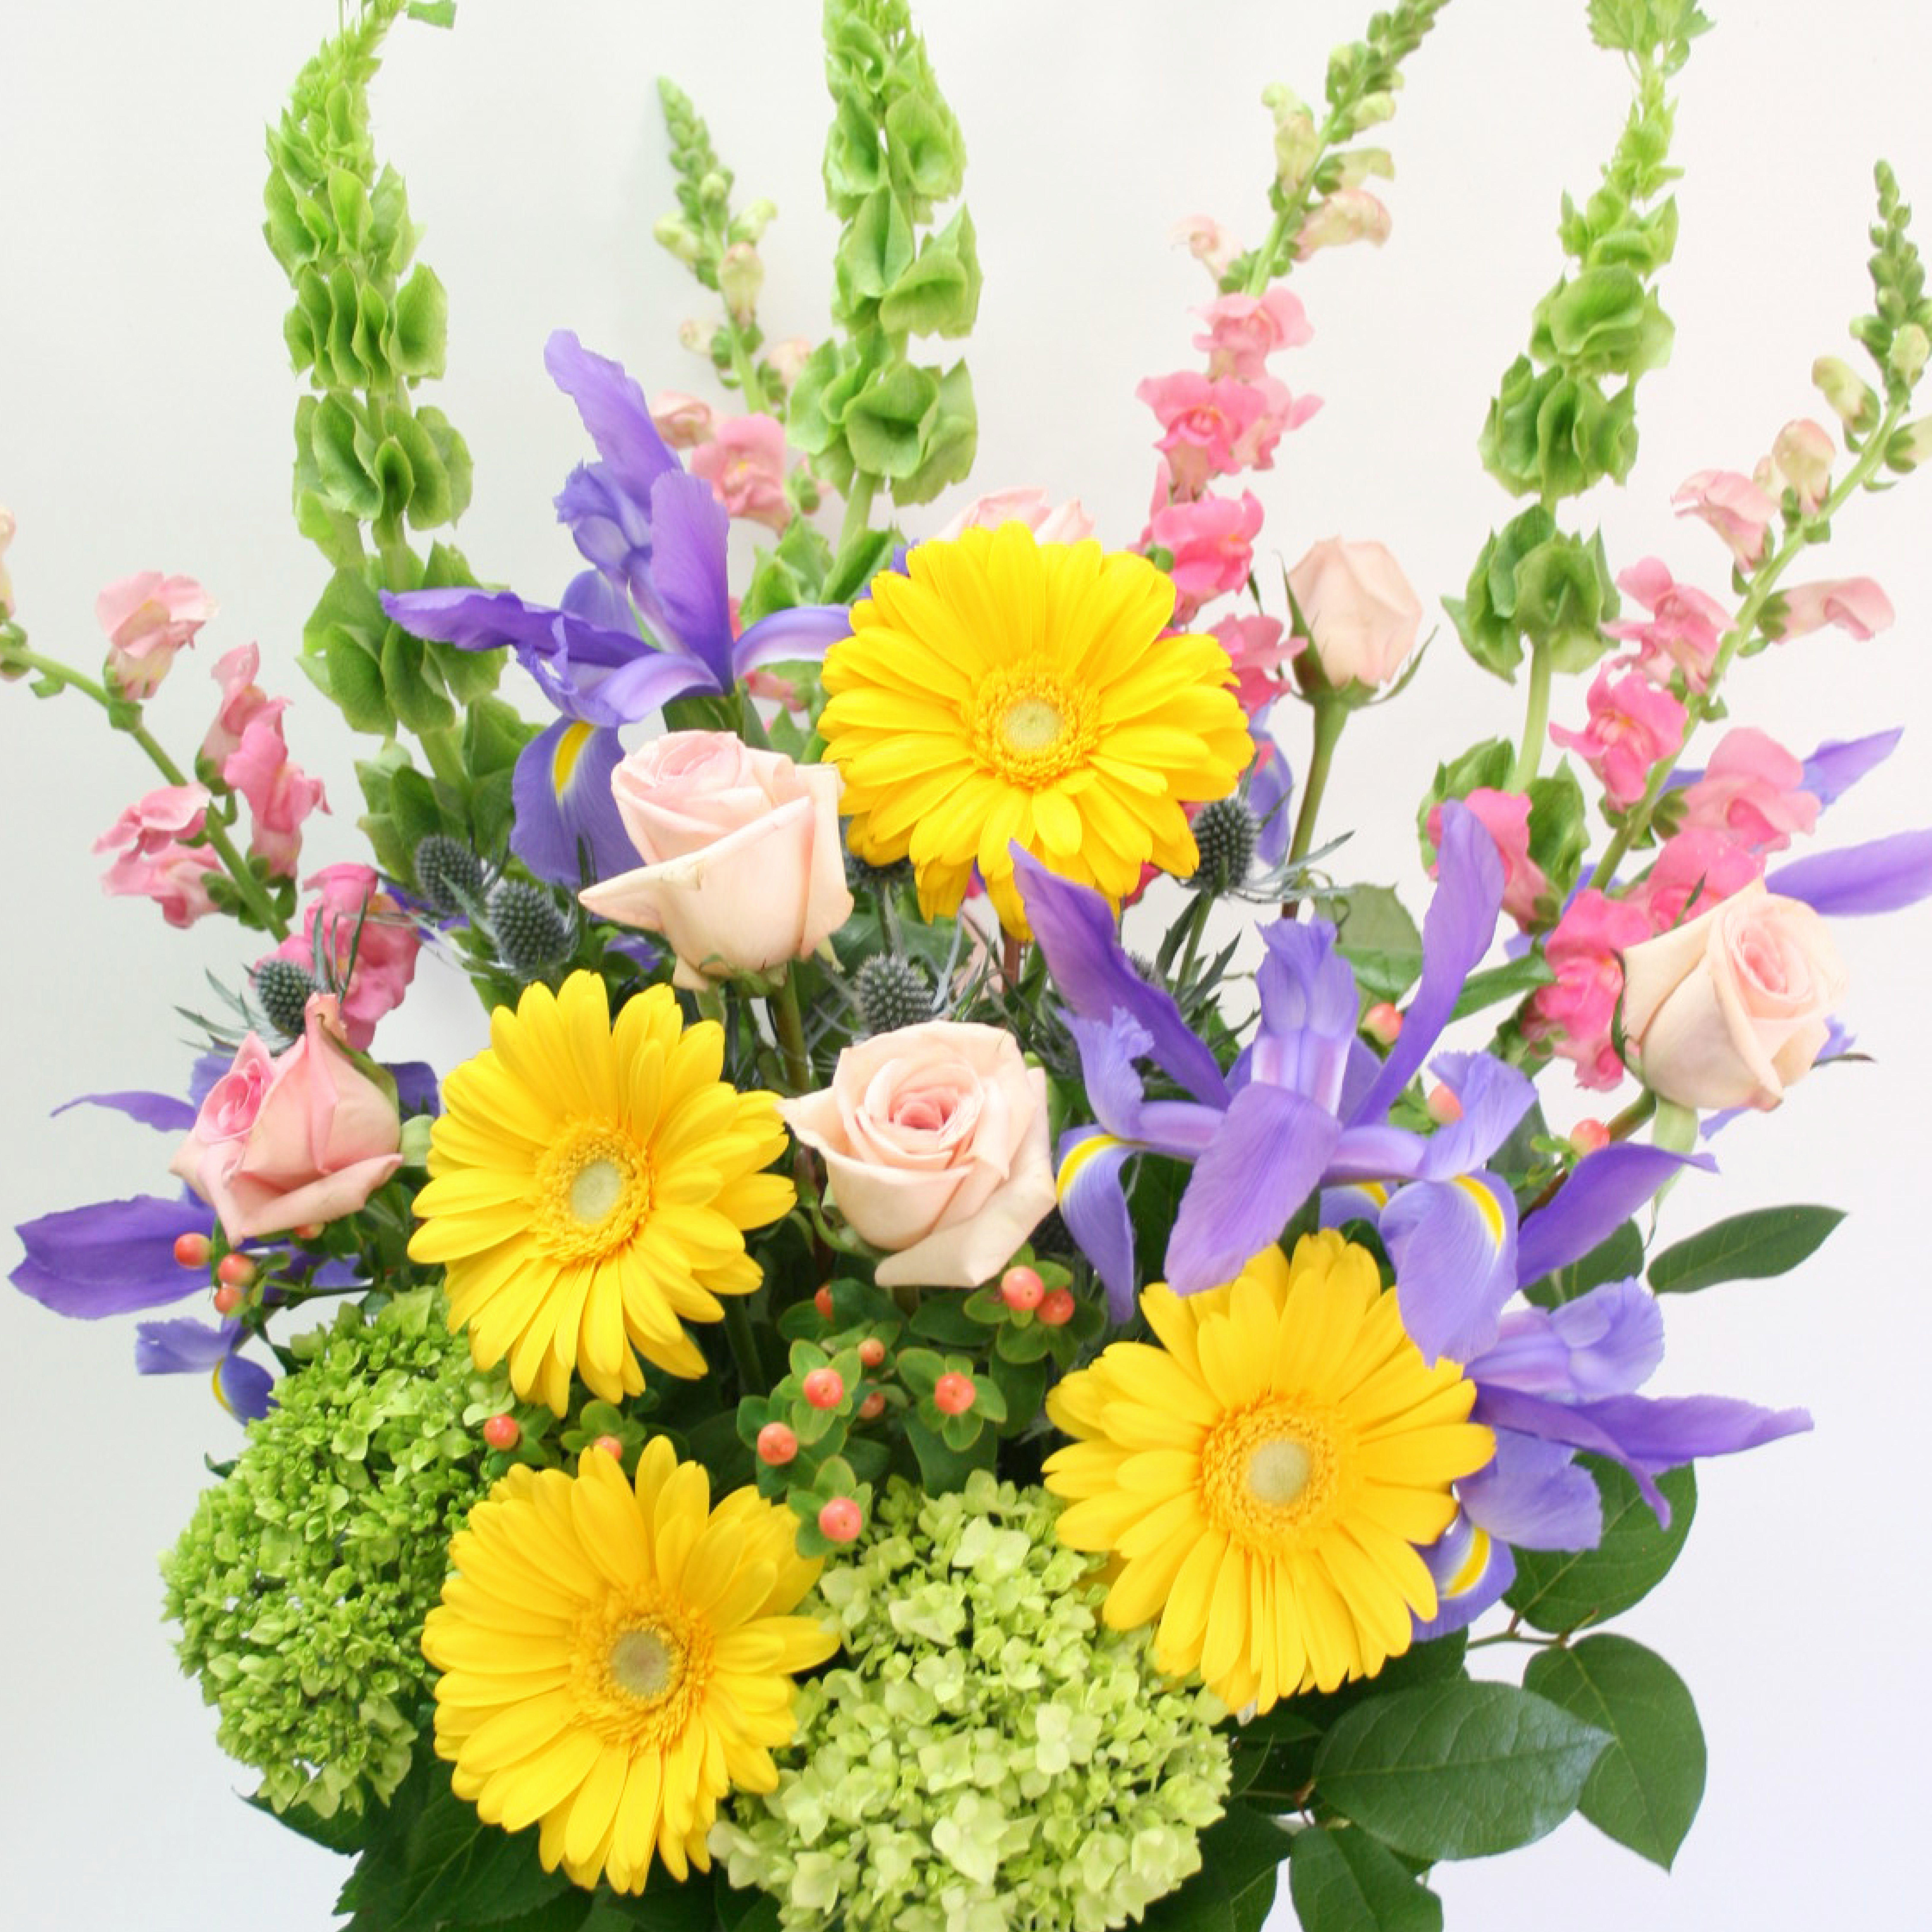 Mother's Day Flowers Freytag's Florist Austin, TX